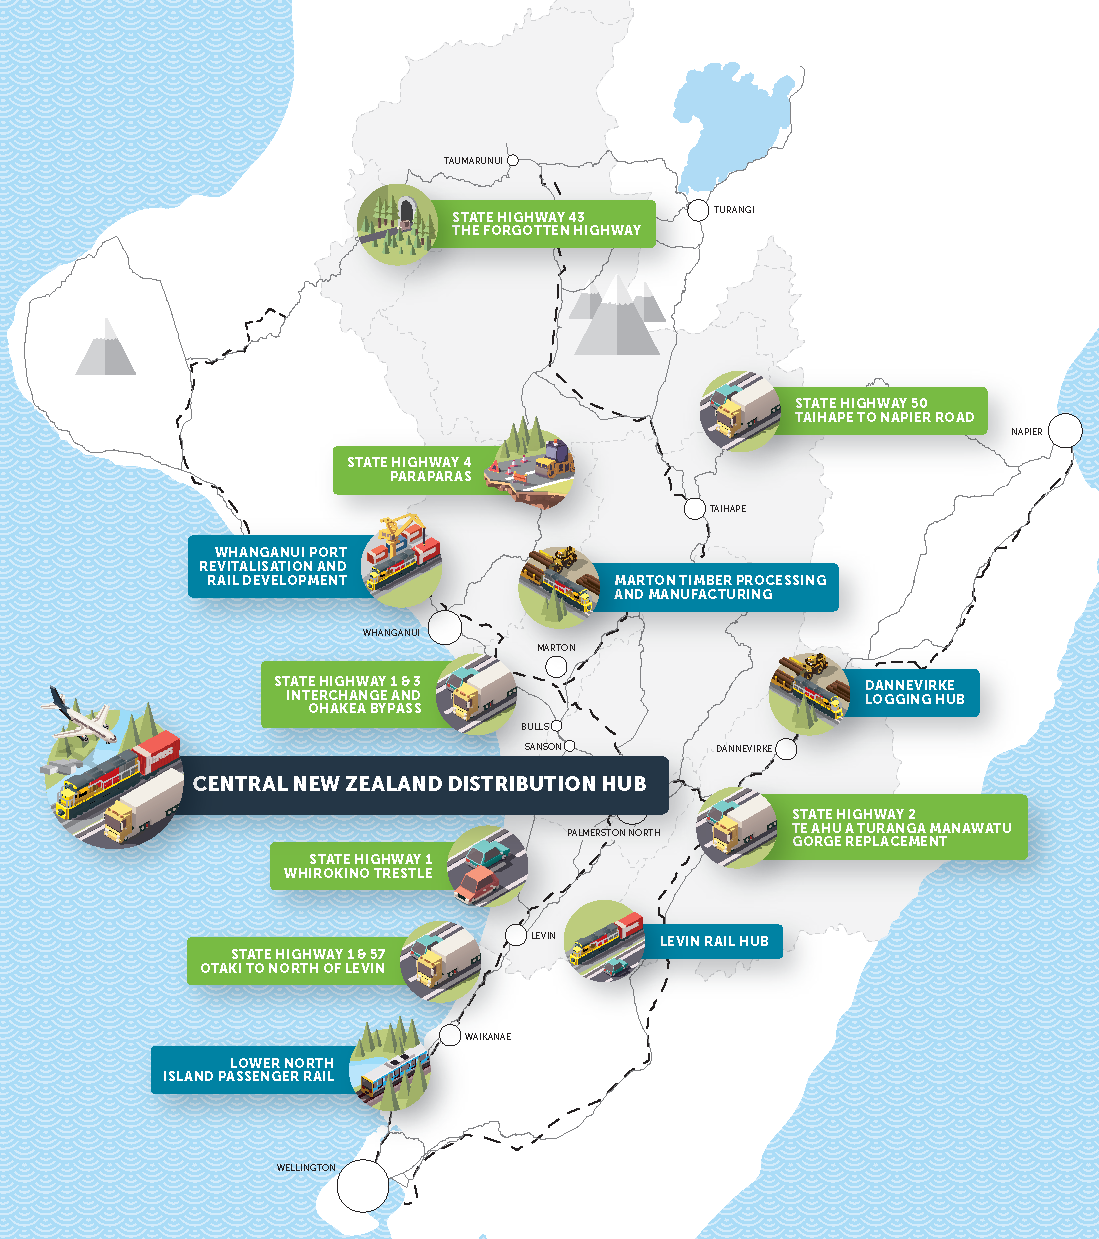 Regional transport initiatives